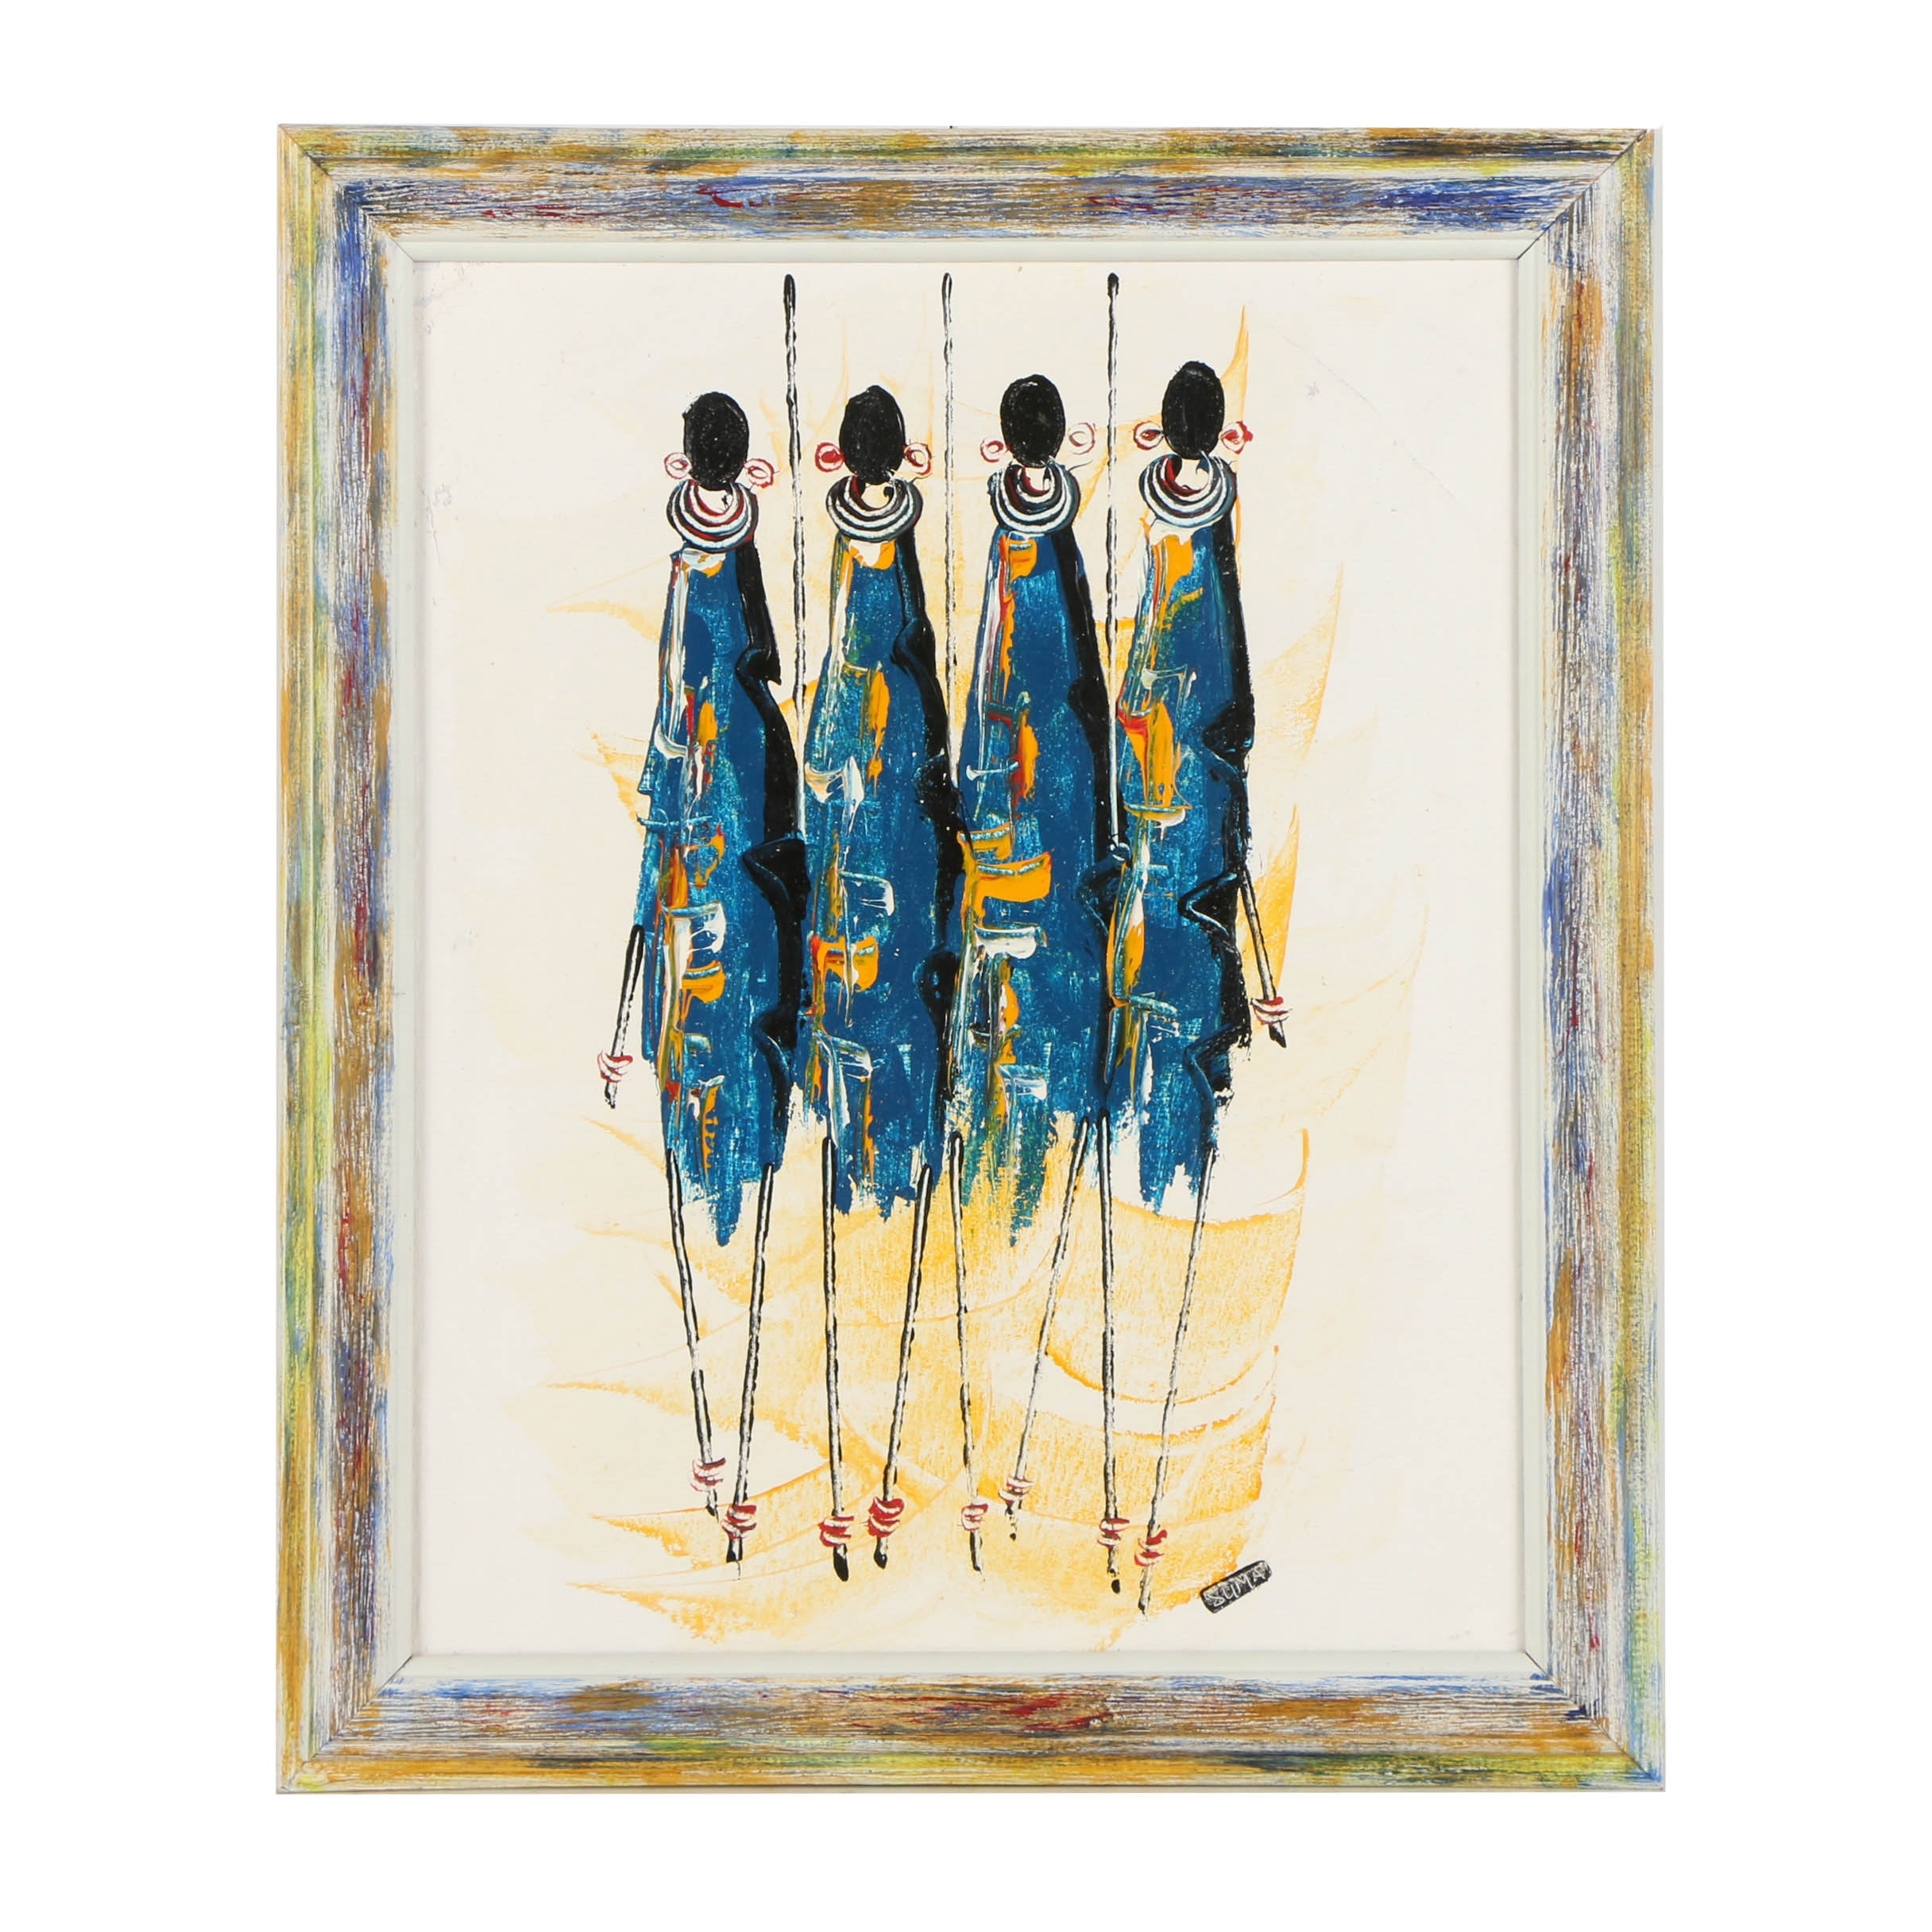 Suma Acrylic Painting on Canvas